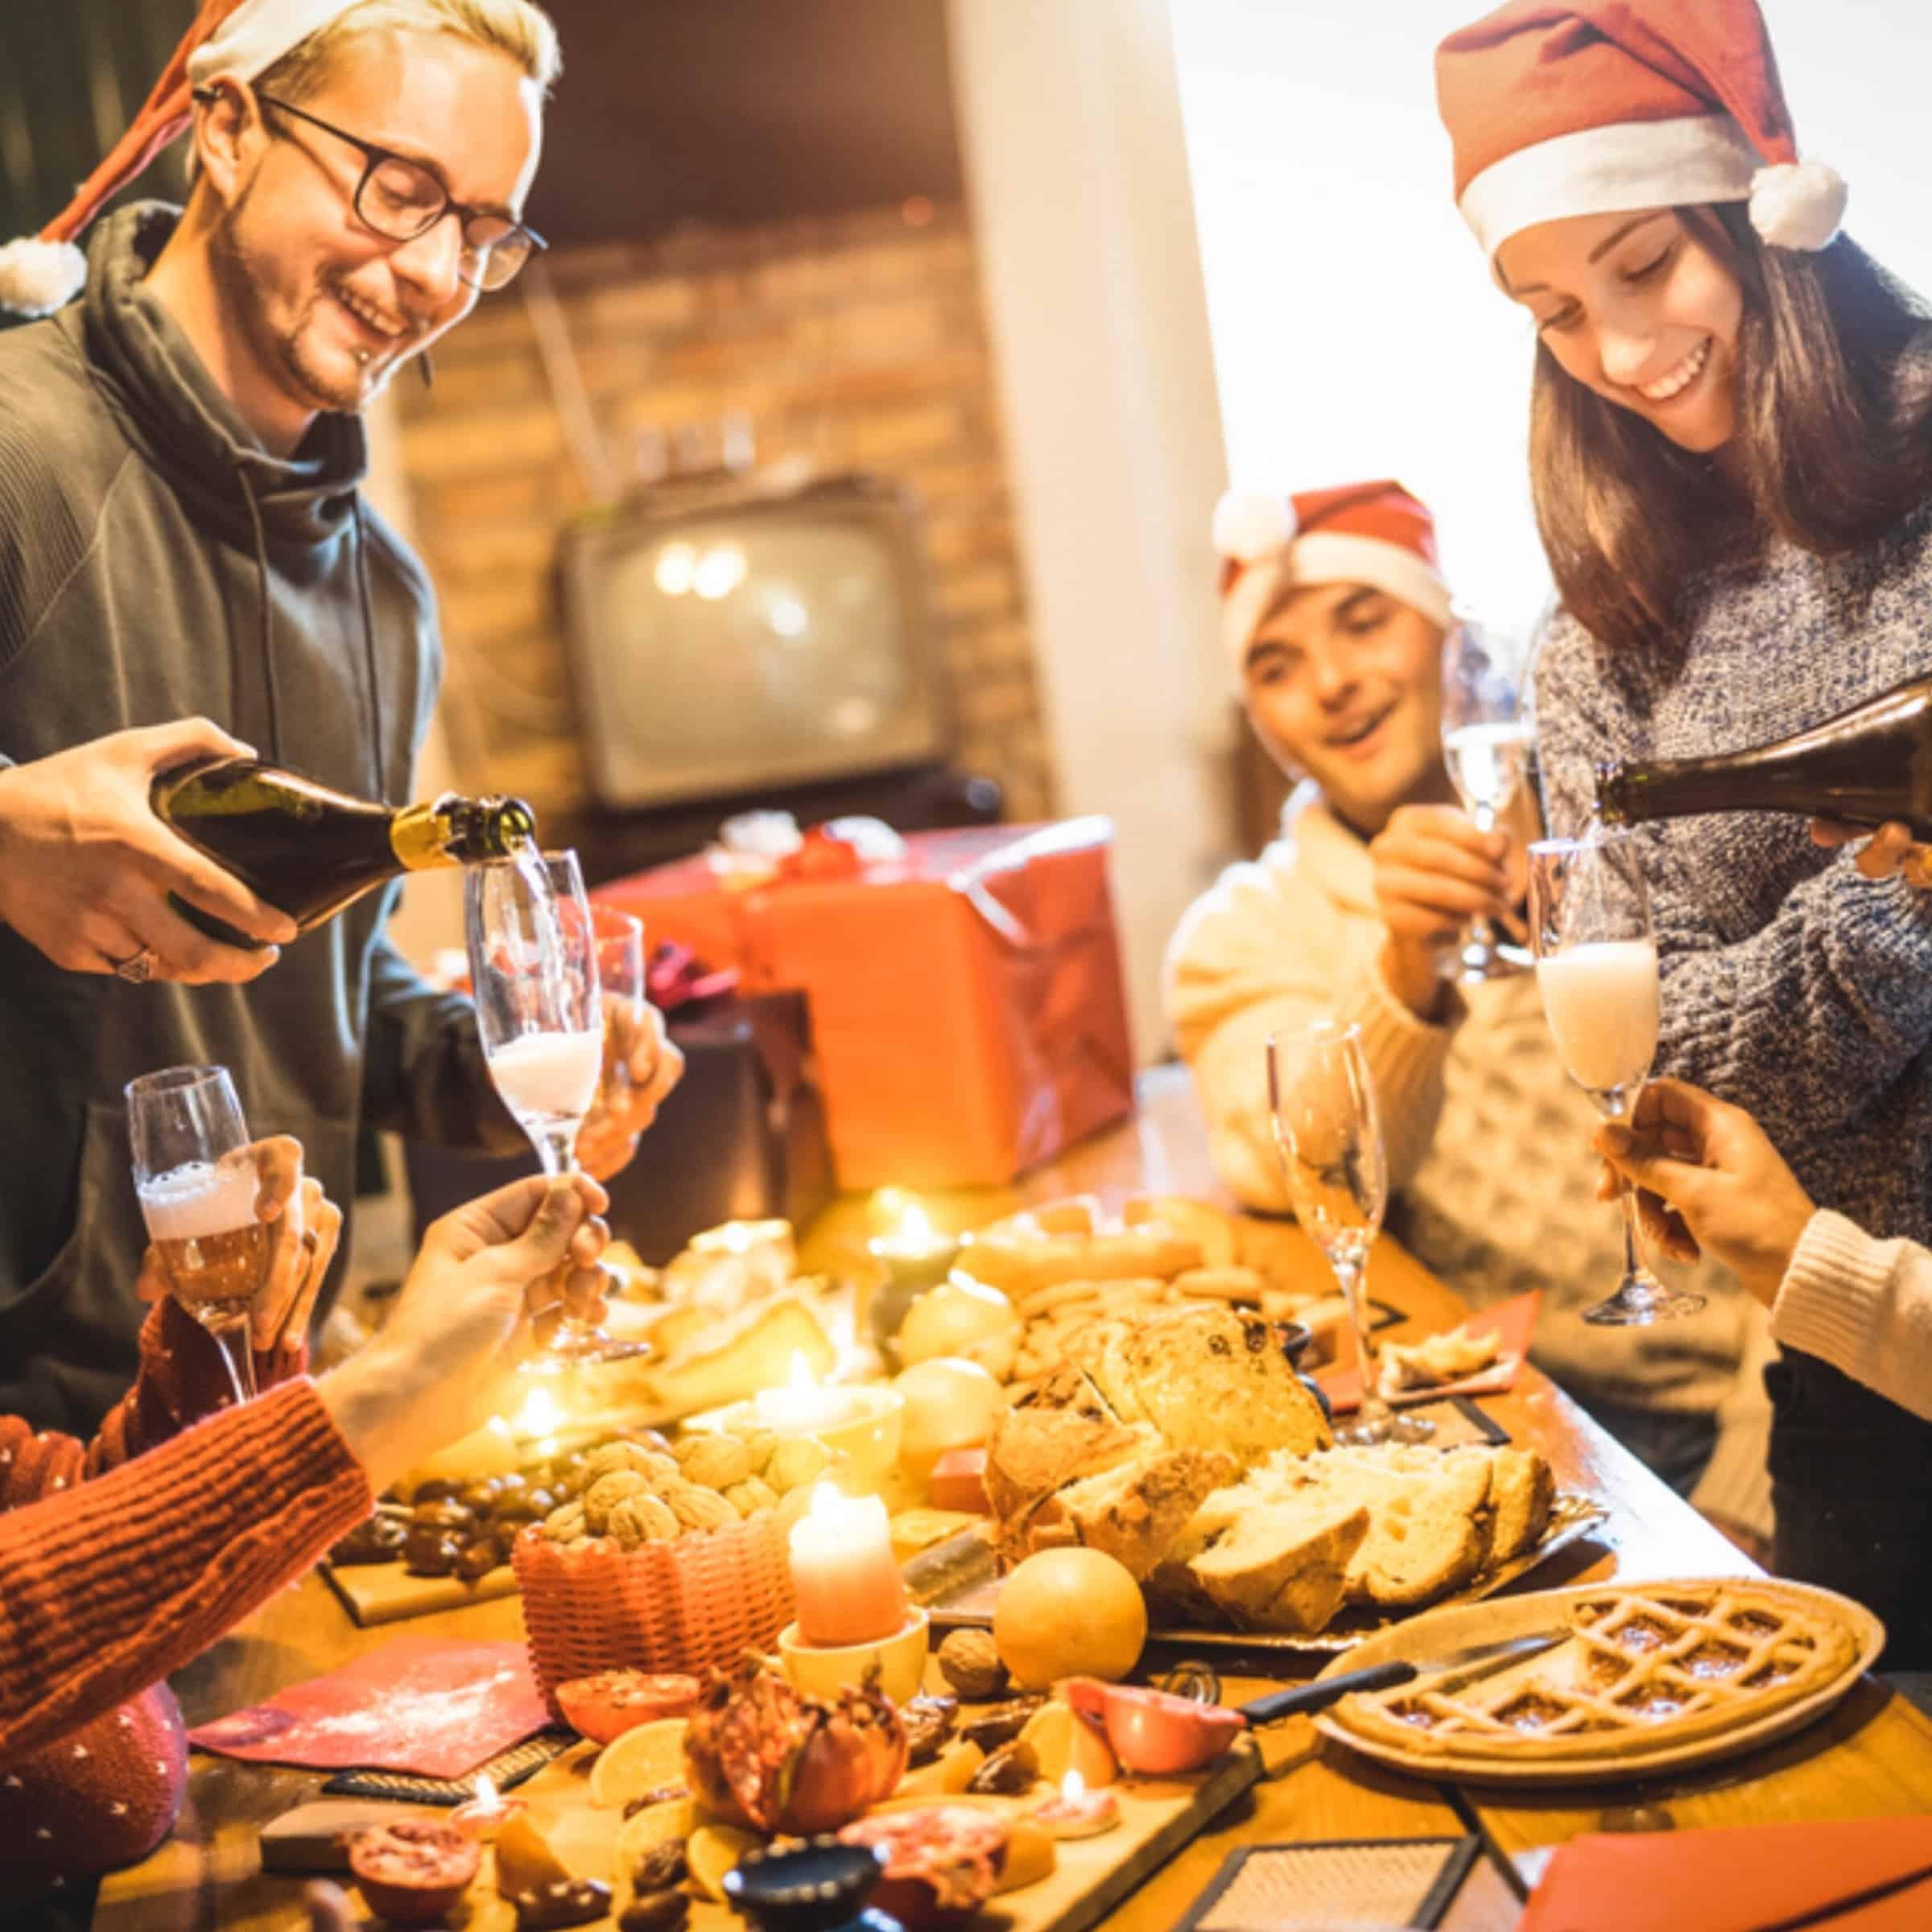 Holiday Weight Loss Plans - Holiday Food - Holiday Weight Loss